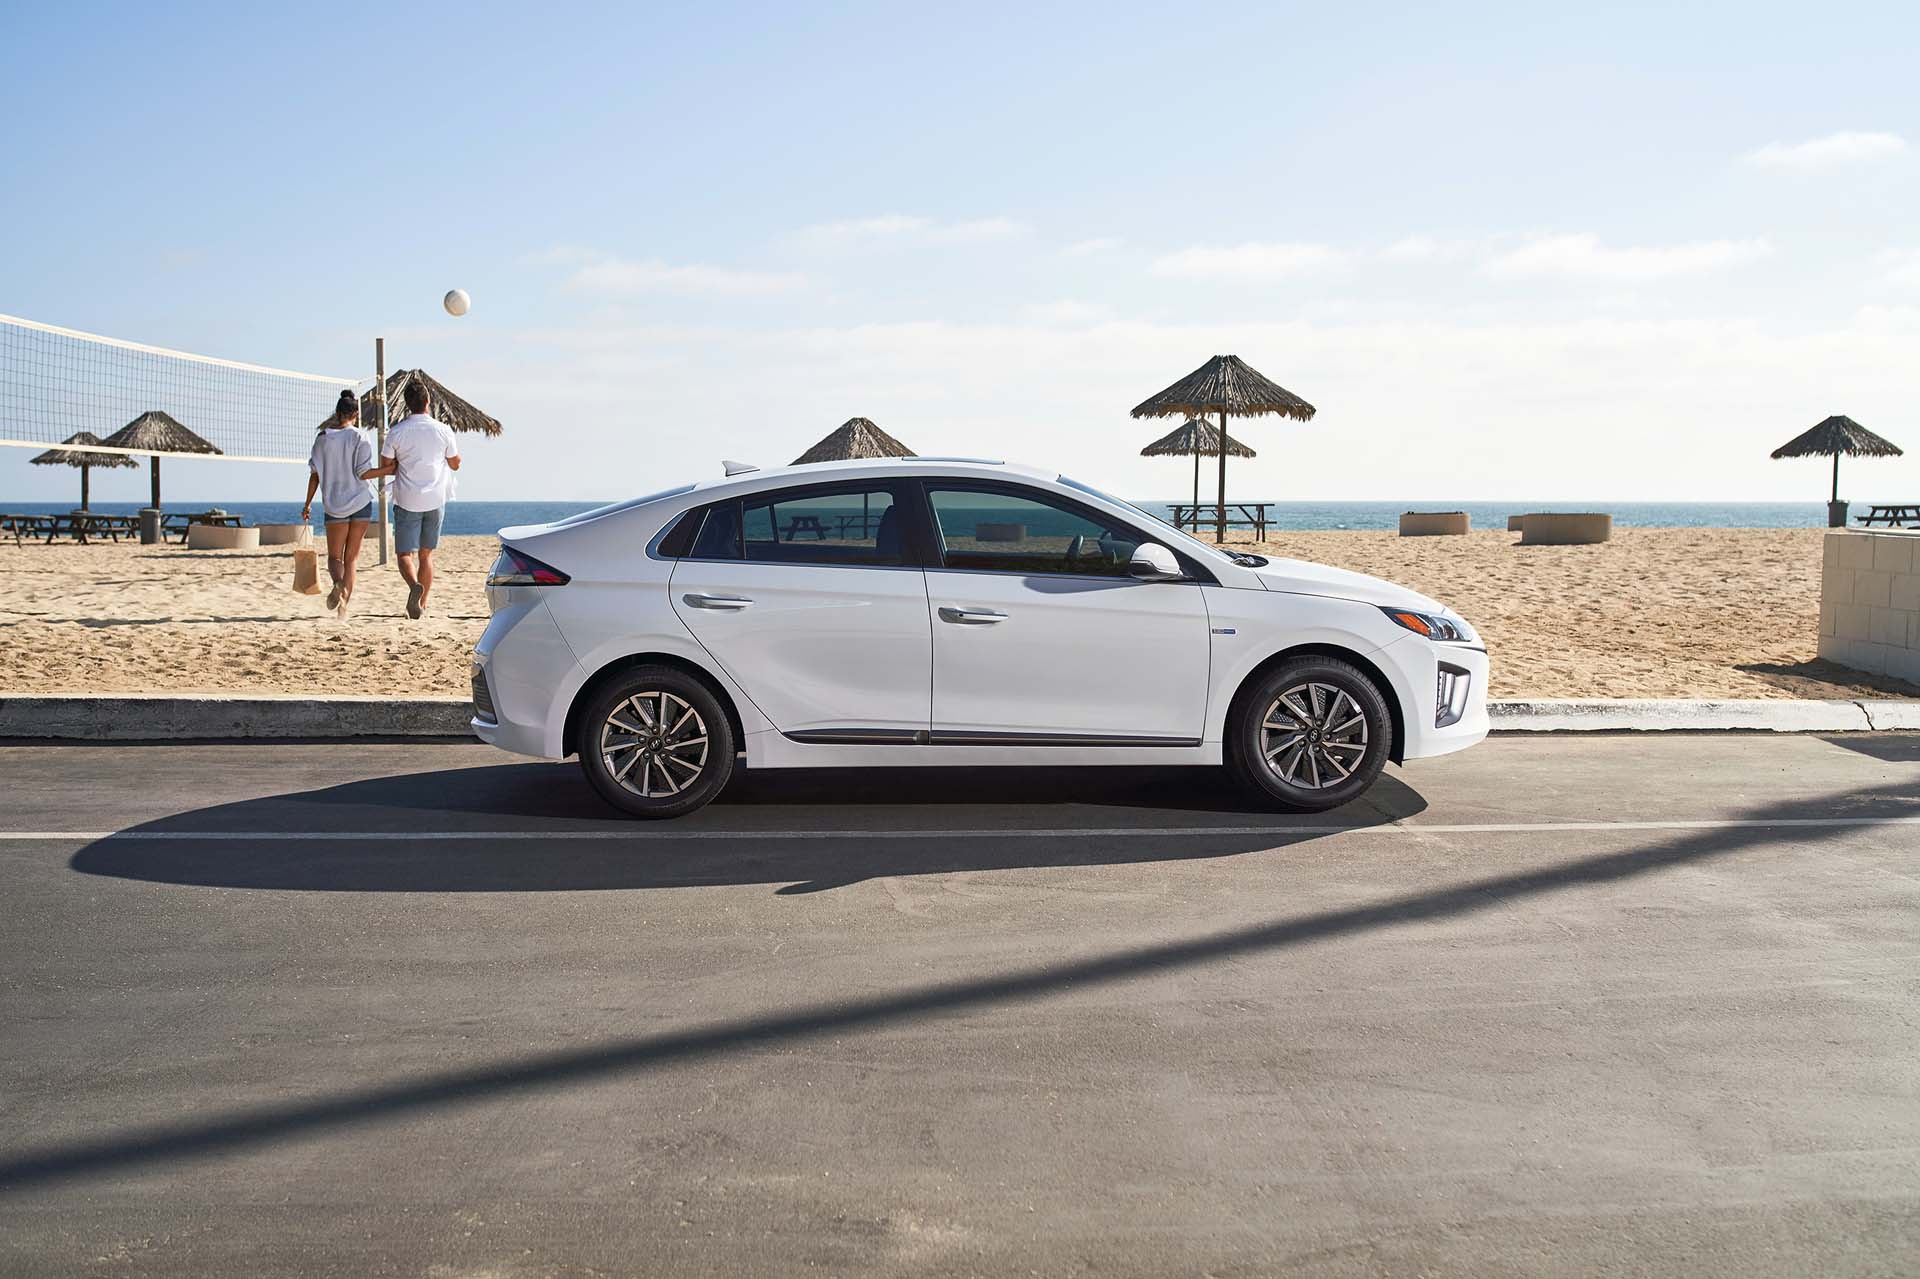 Hyundai has 5 reminders for making your EV battery last longer